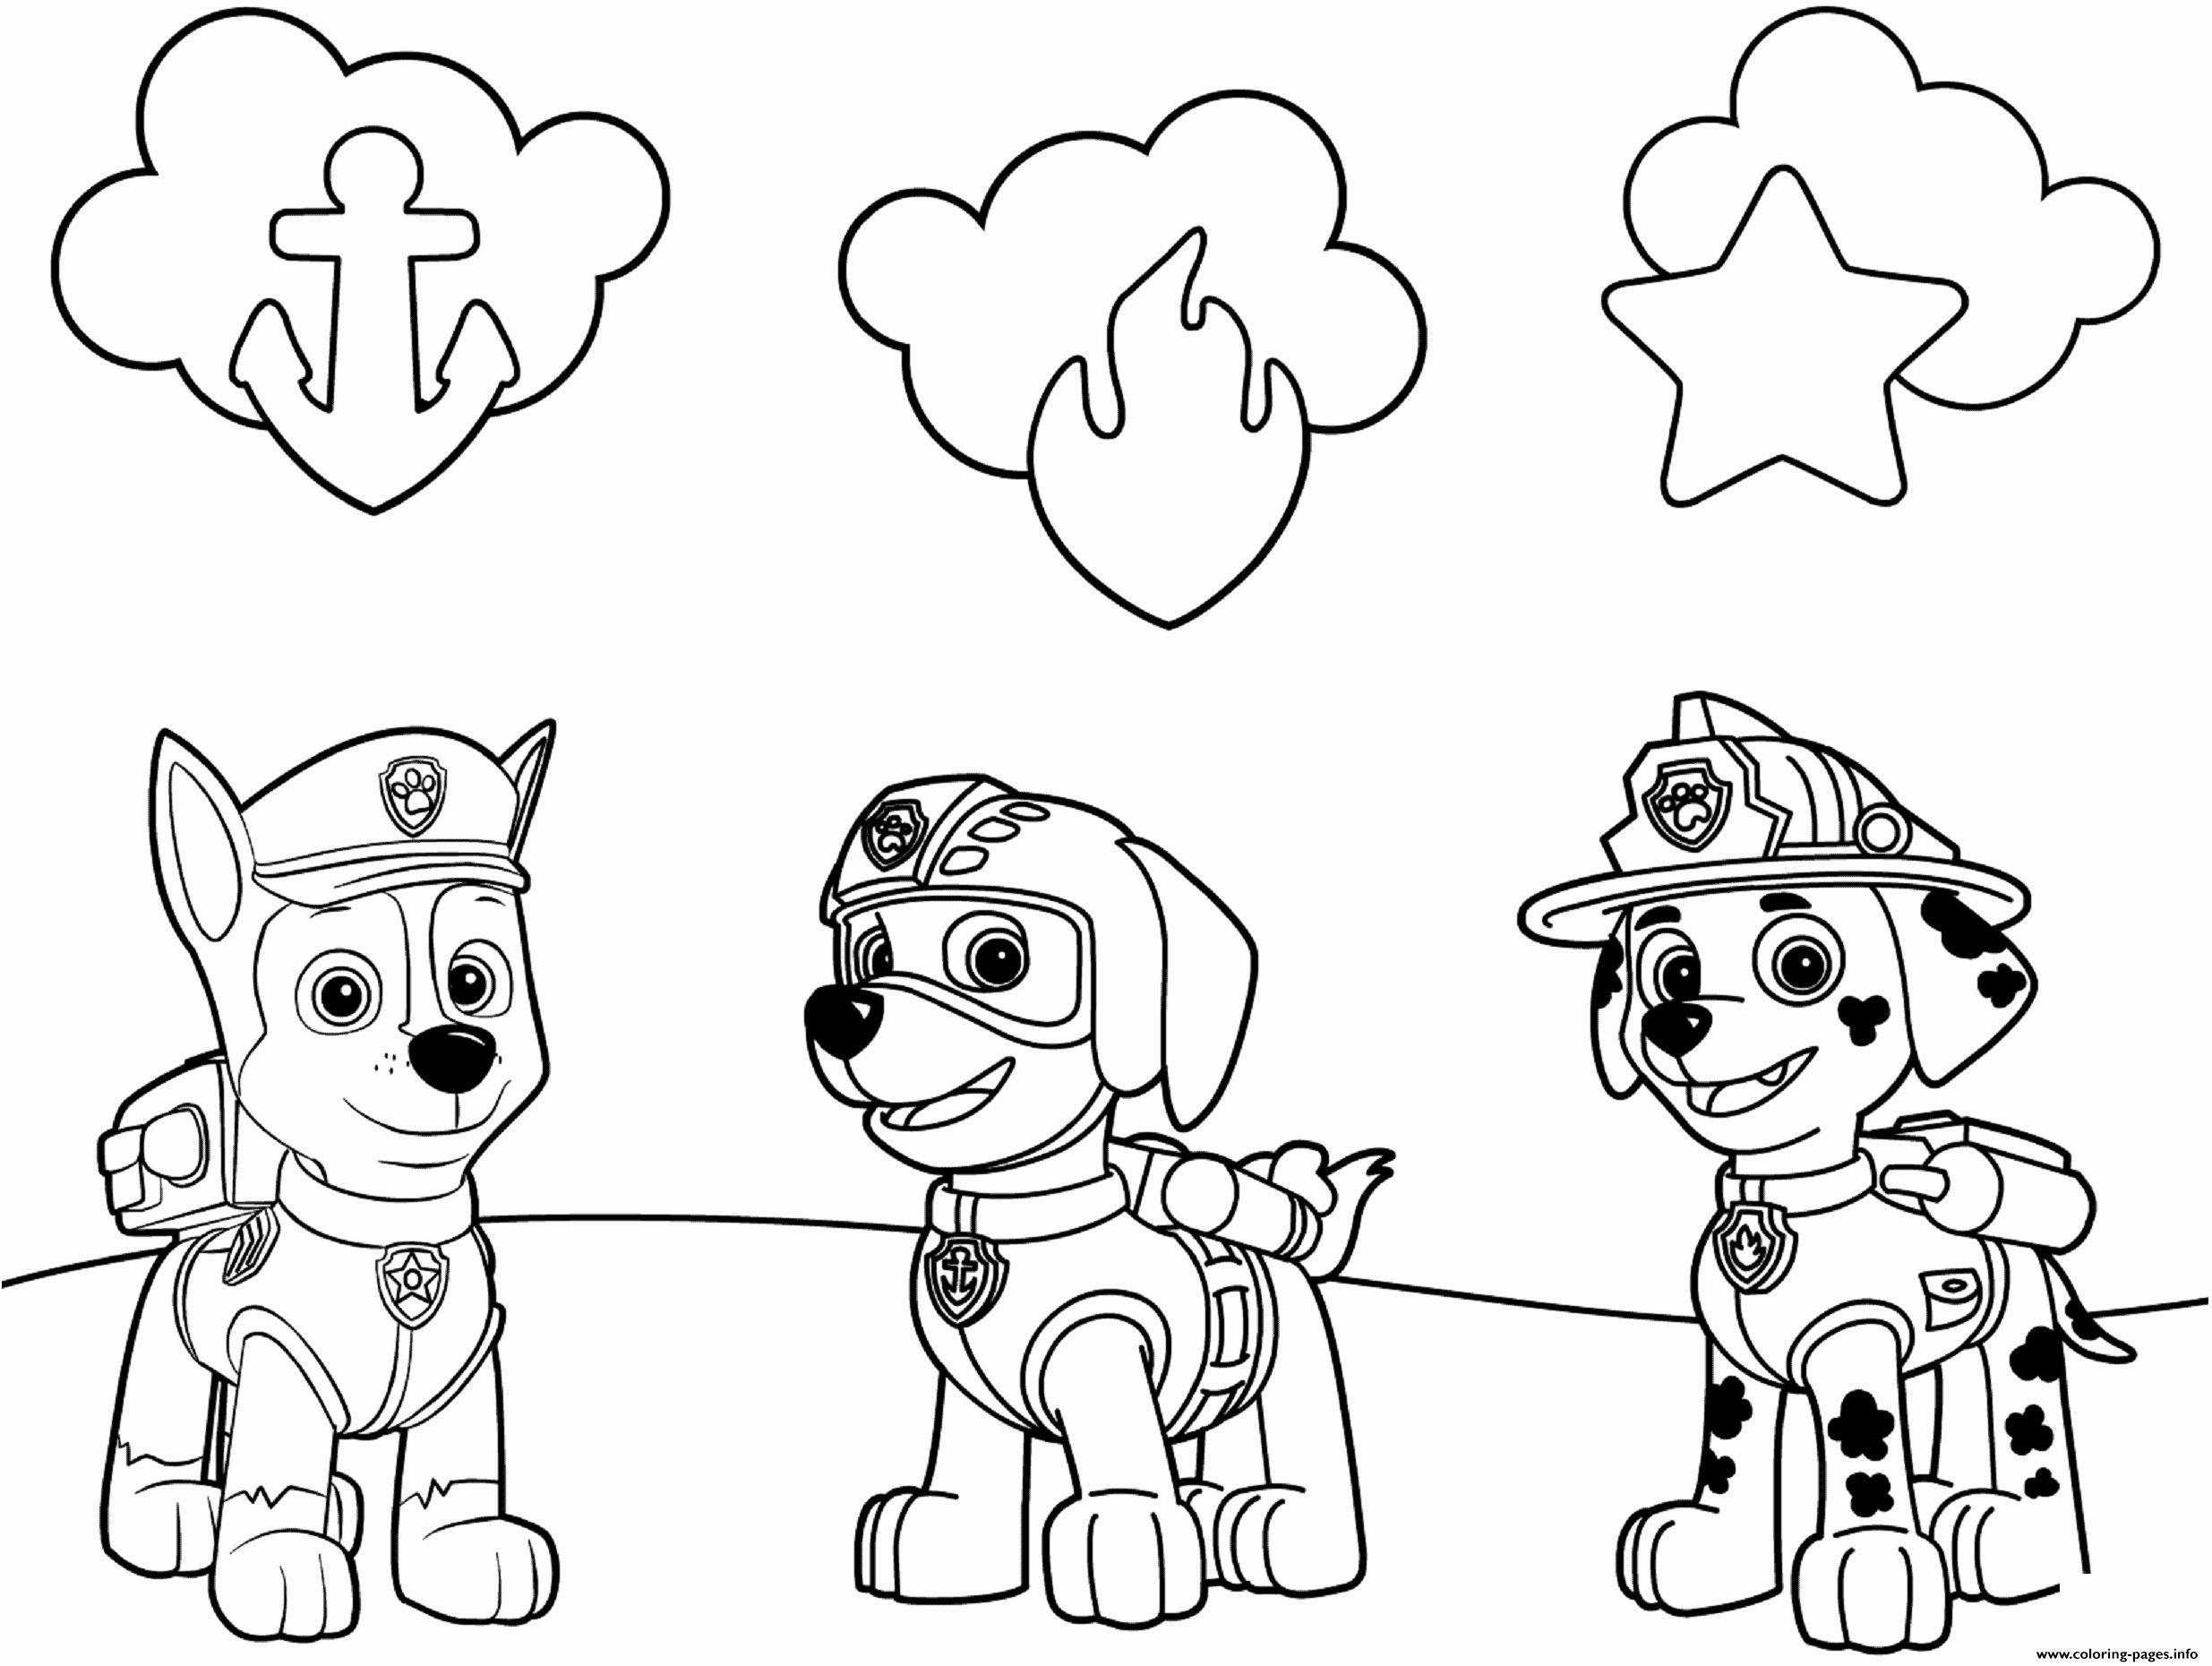 24 Marshall Paw Patrol Coloring Page Southwestdanceacademy Com In 2020 Paw Patrol Coloring Pages Paw Patrol Printables Paw Patrol Coloring